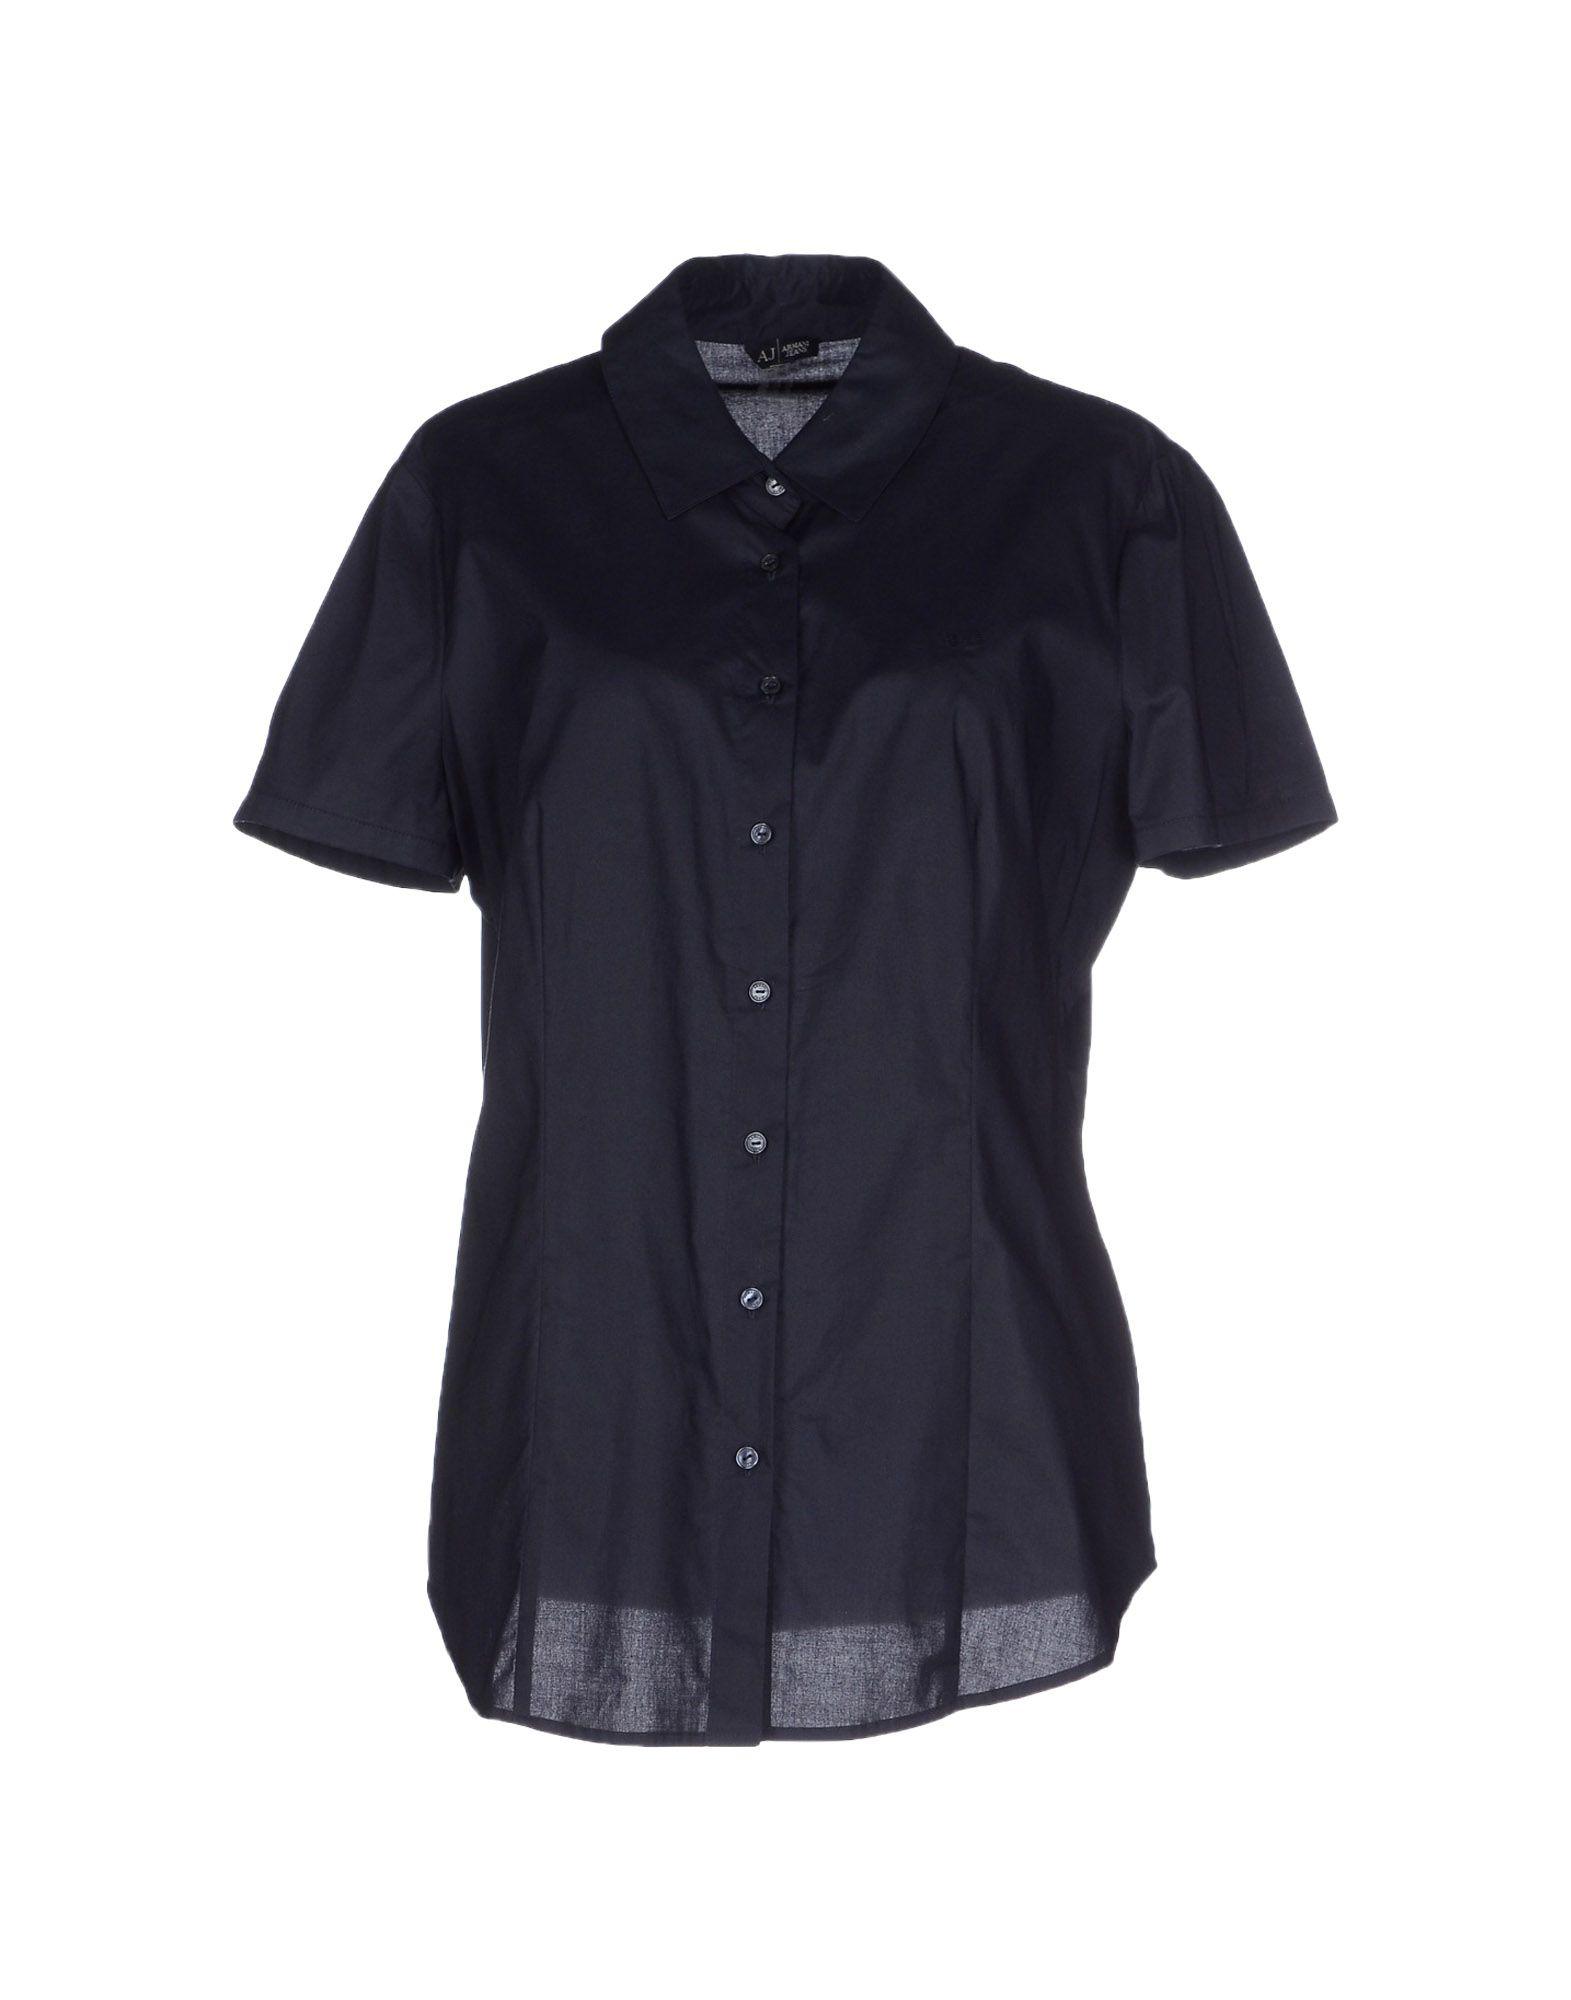 ARMANI JEANS Pубашка ремень женский armani jeans цвет черный 75104 c2 12 размер i 75